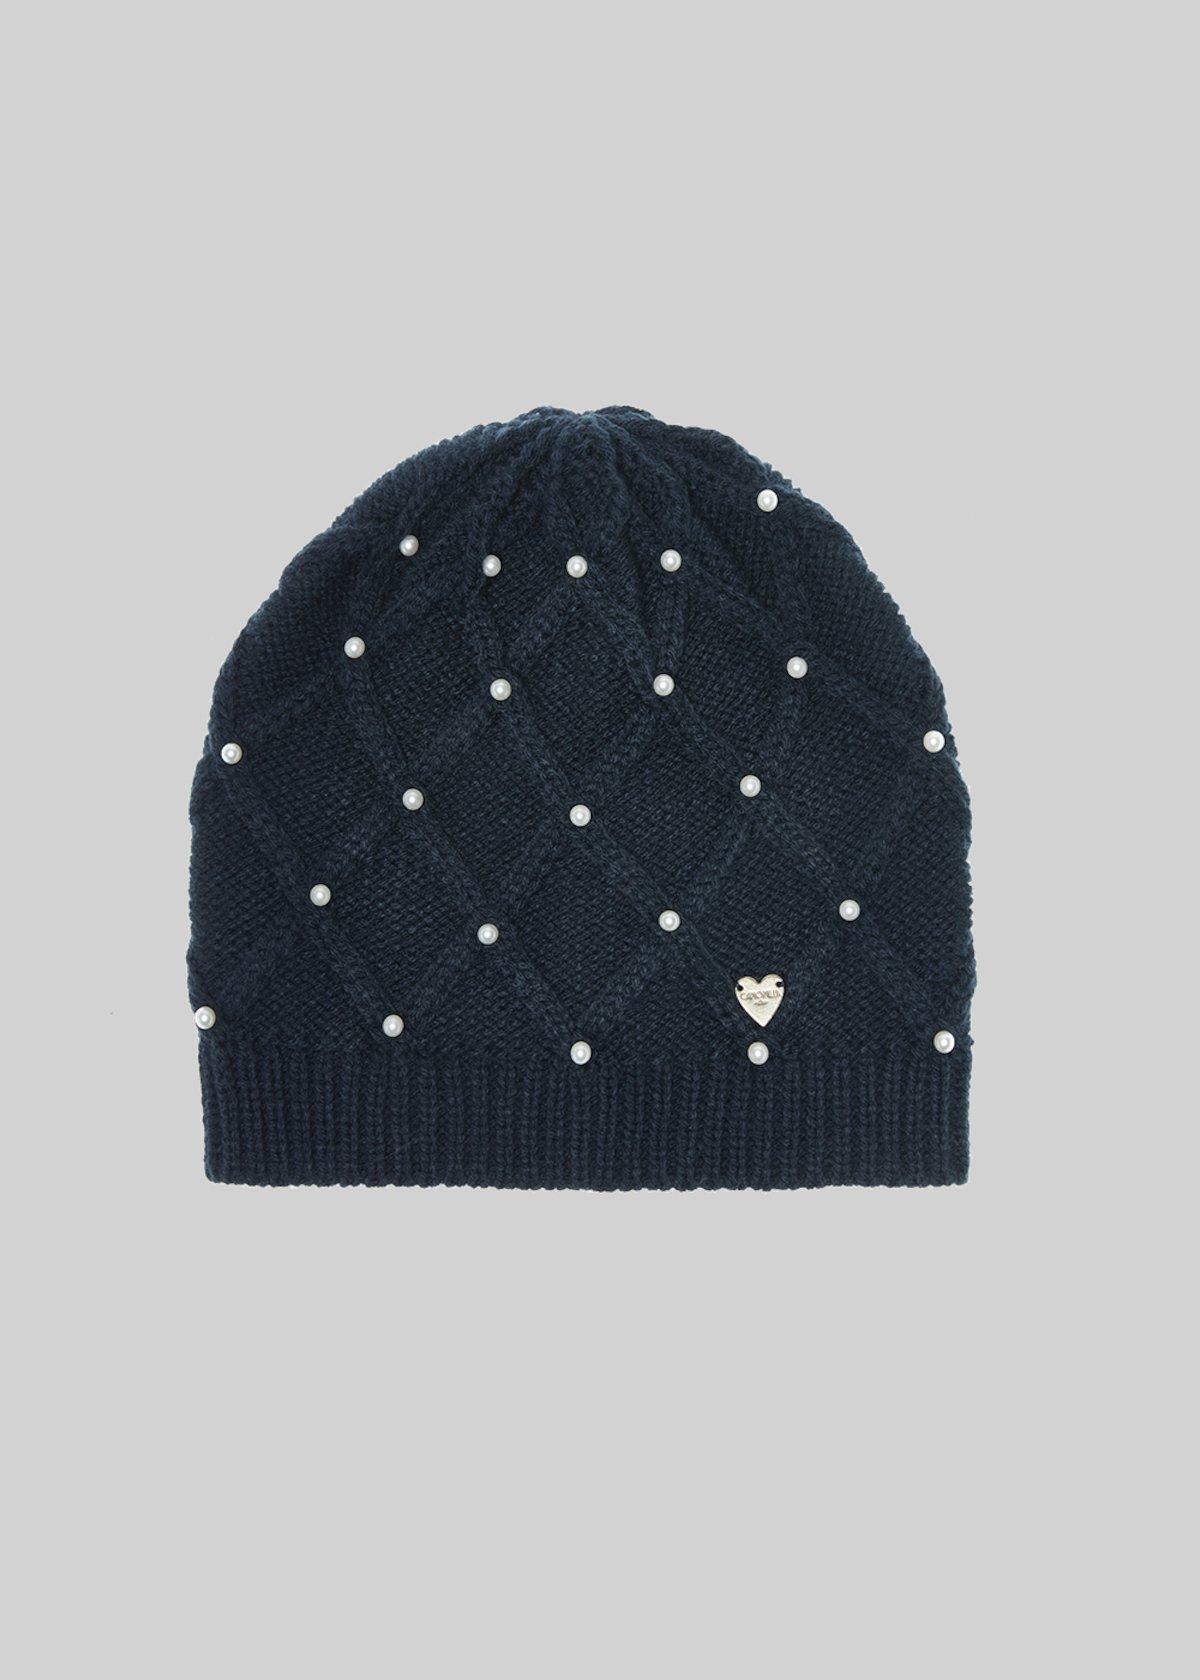 Cheba hat with diamonds and beads - Dark Blue